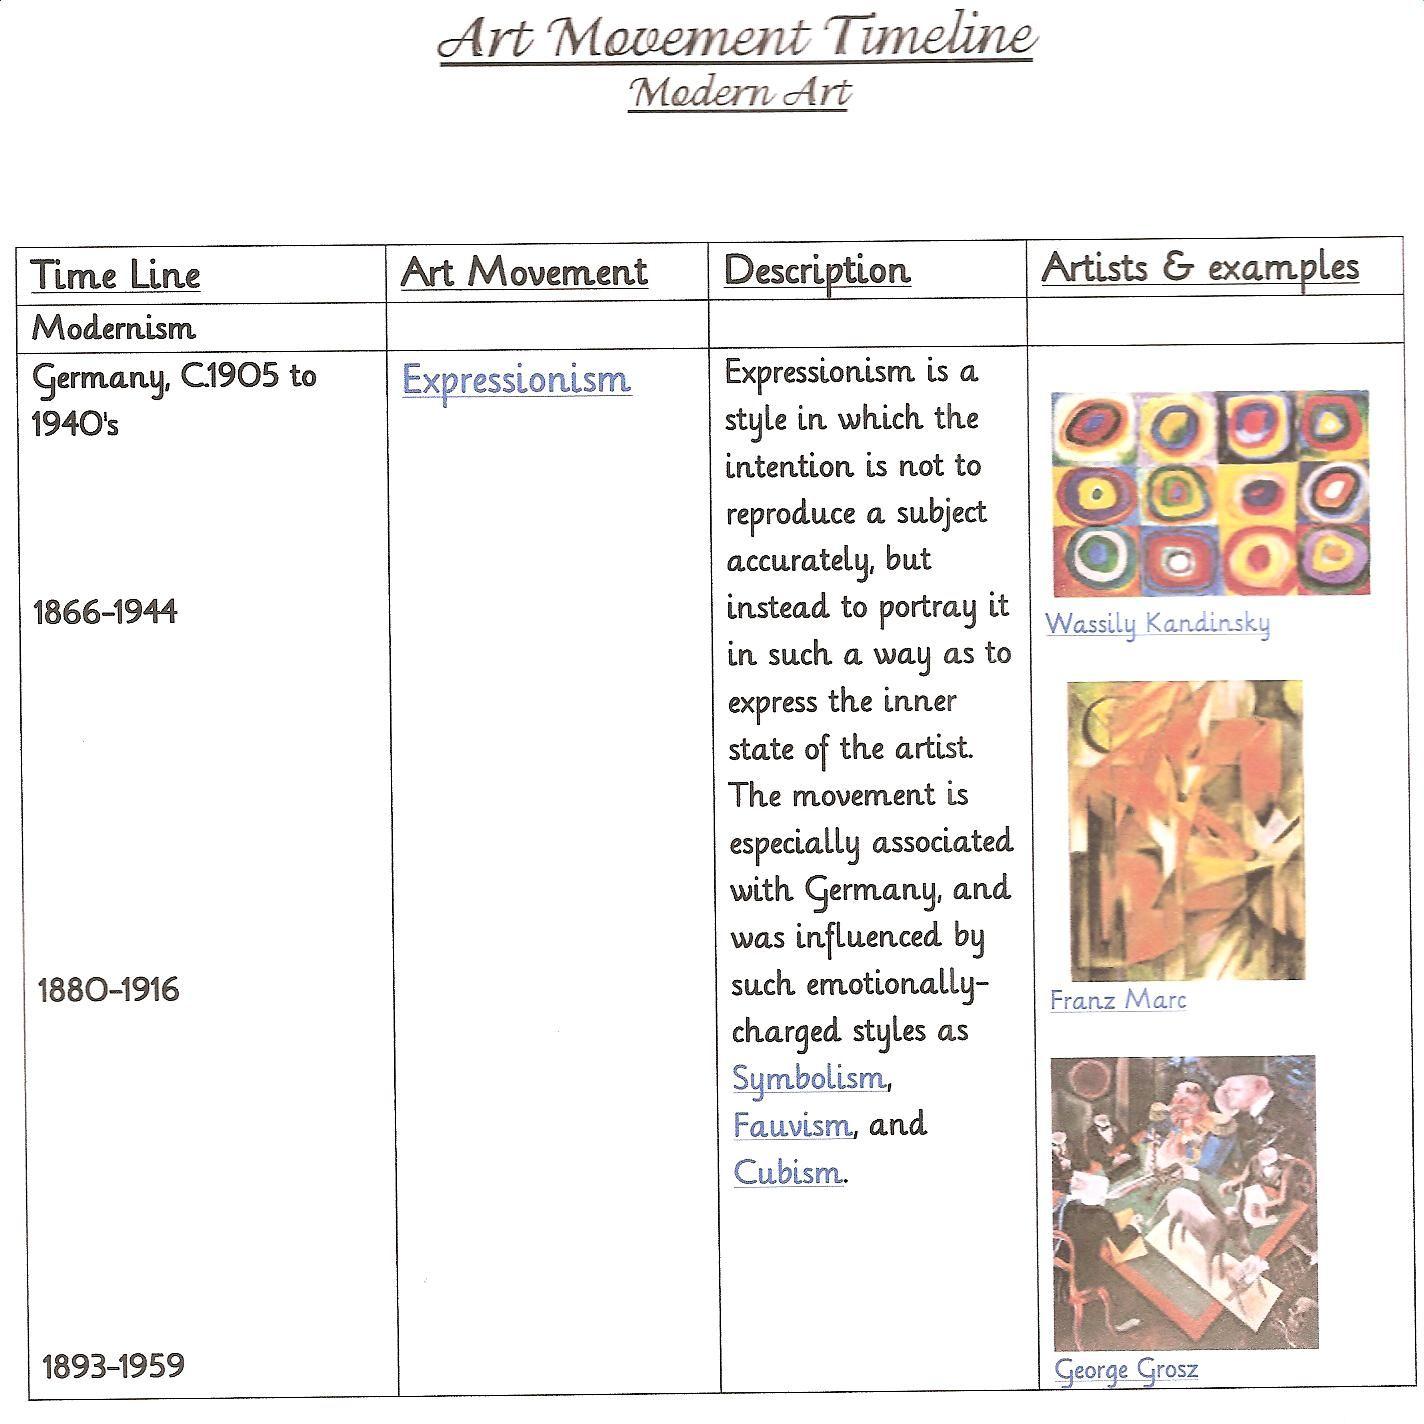 Art Era Timeline 4 Modern Art